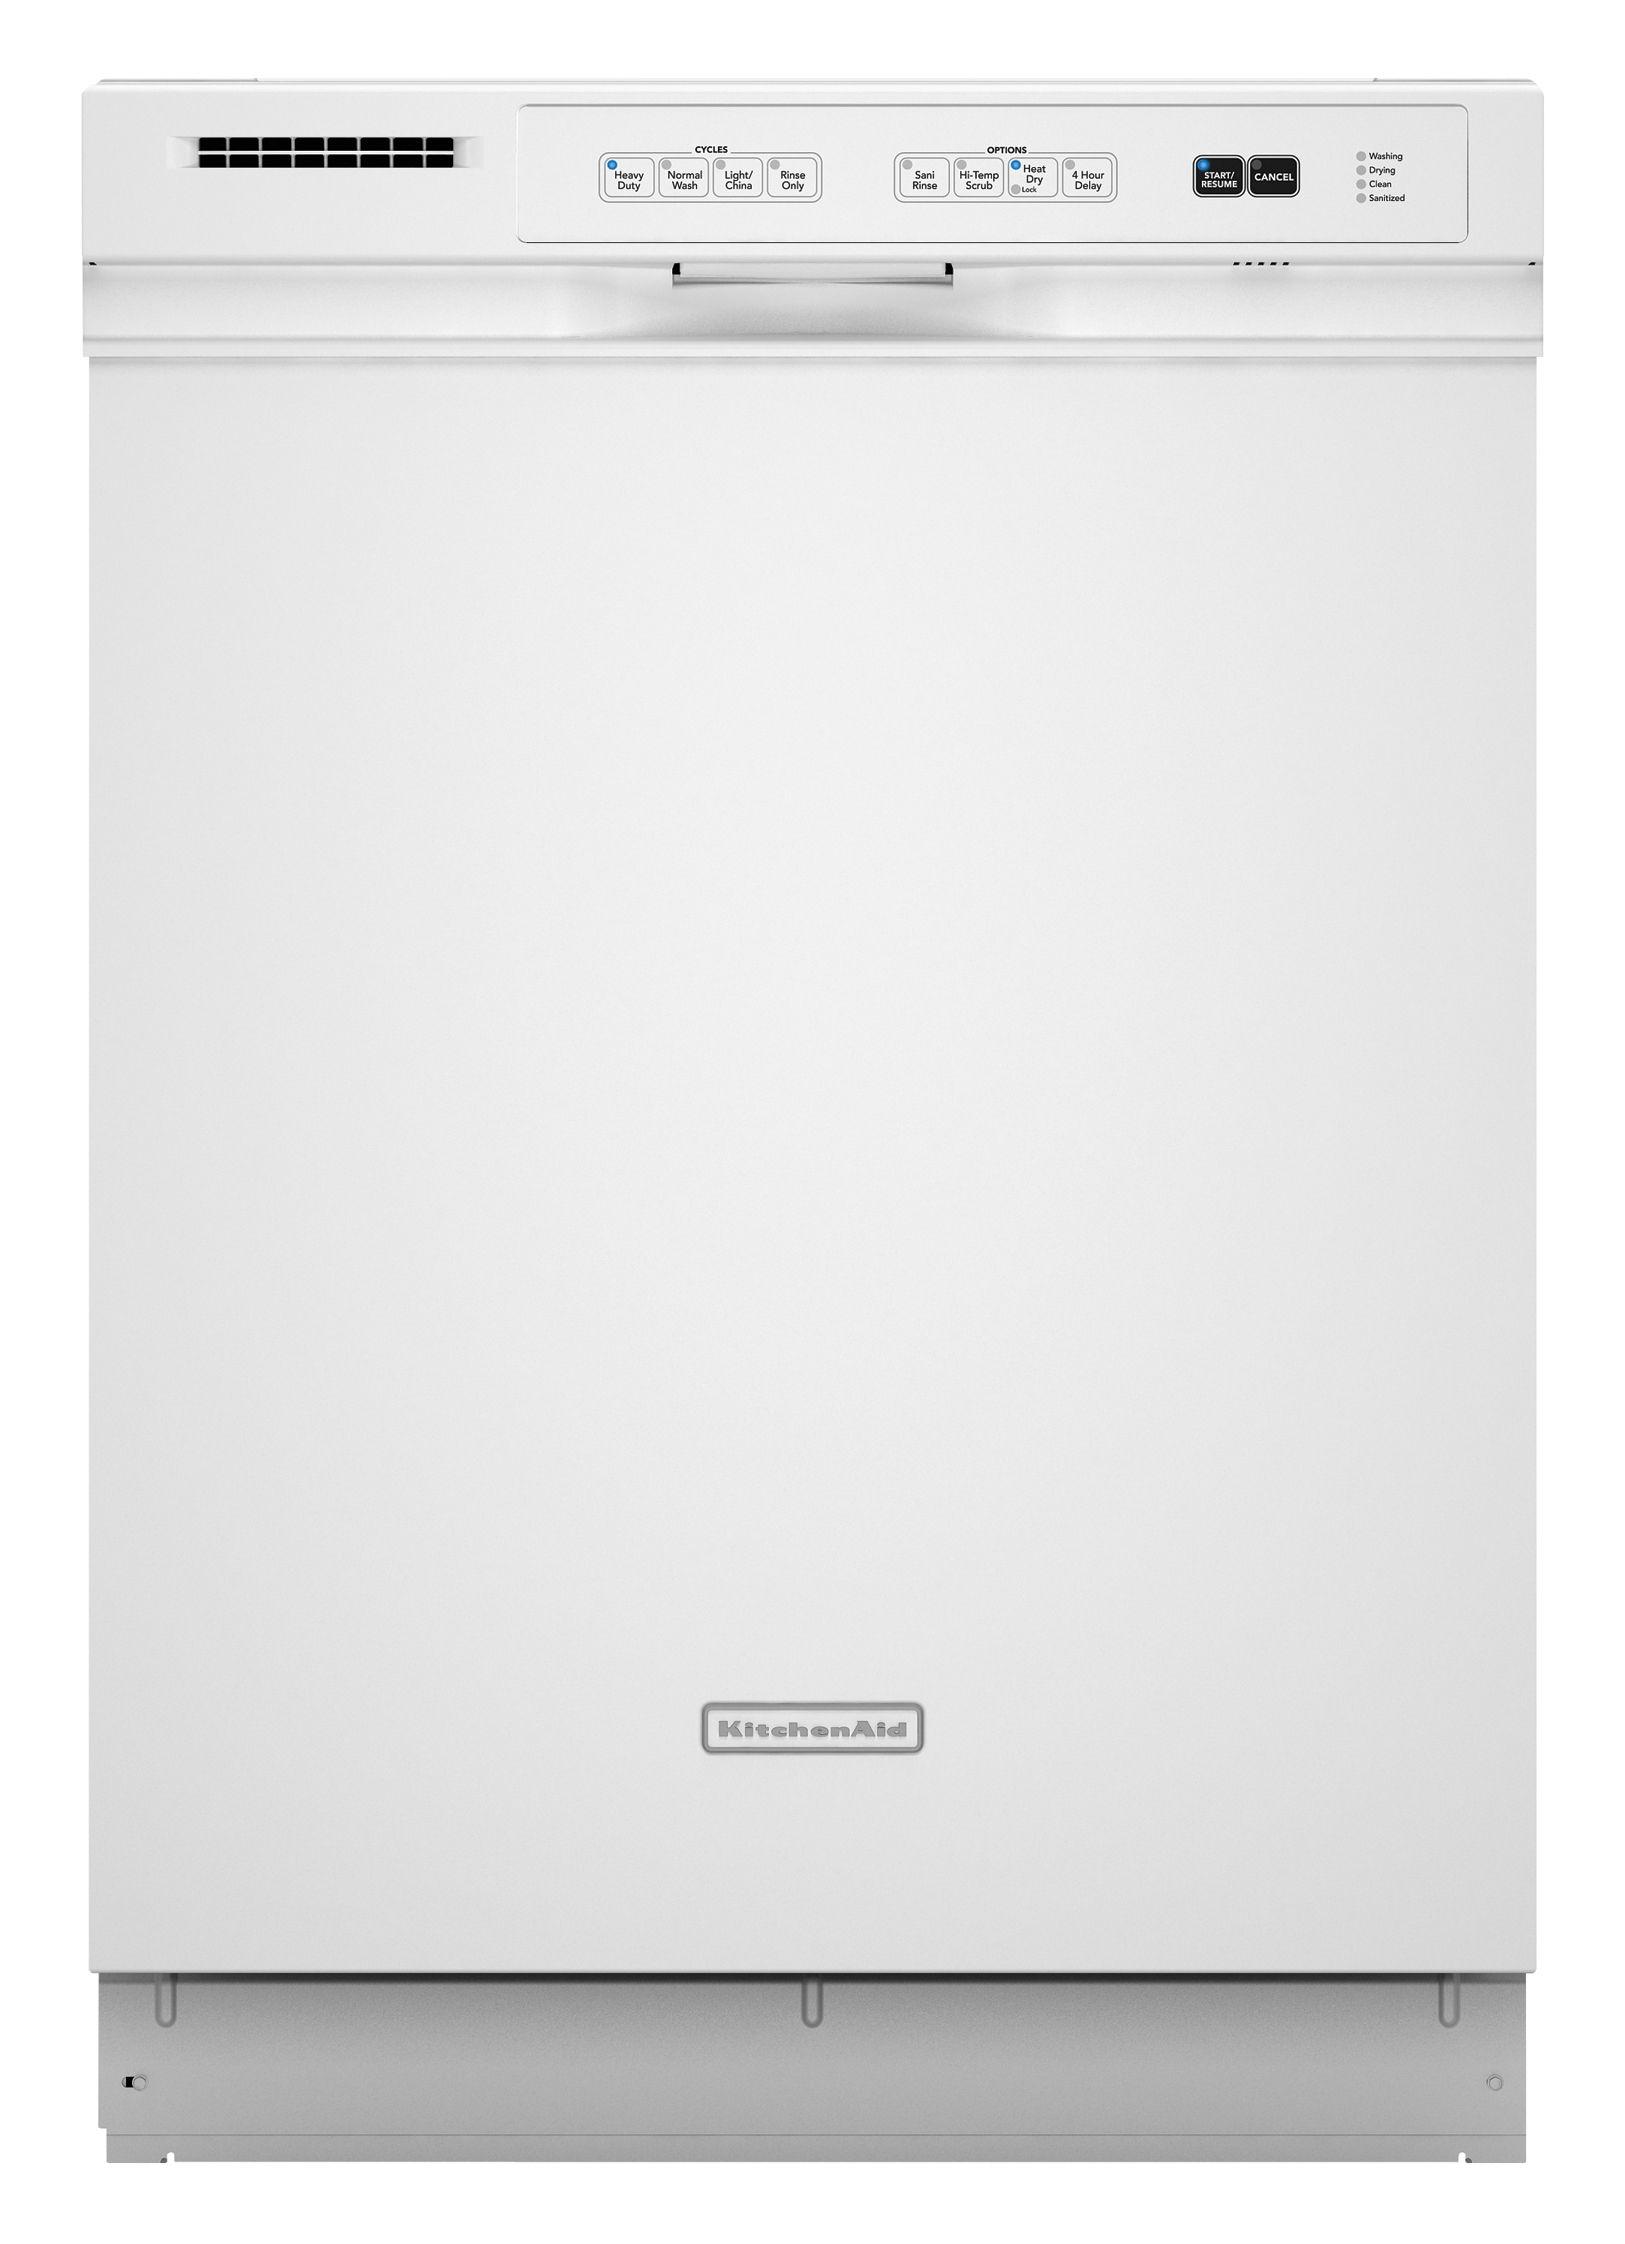 Kitchenaid Dishwasher Kud kitchenaid dishwasher parts | model kudk03itwh3 | sears partsdirect